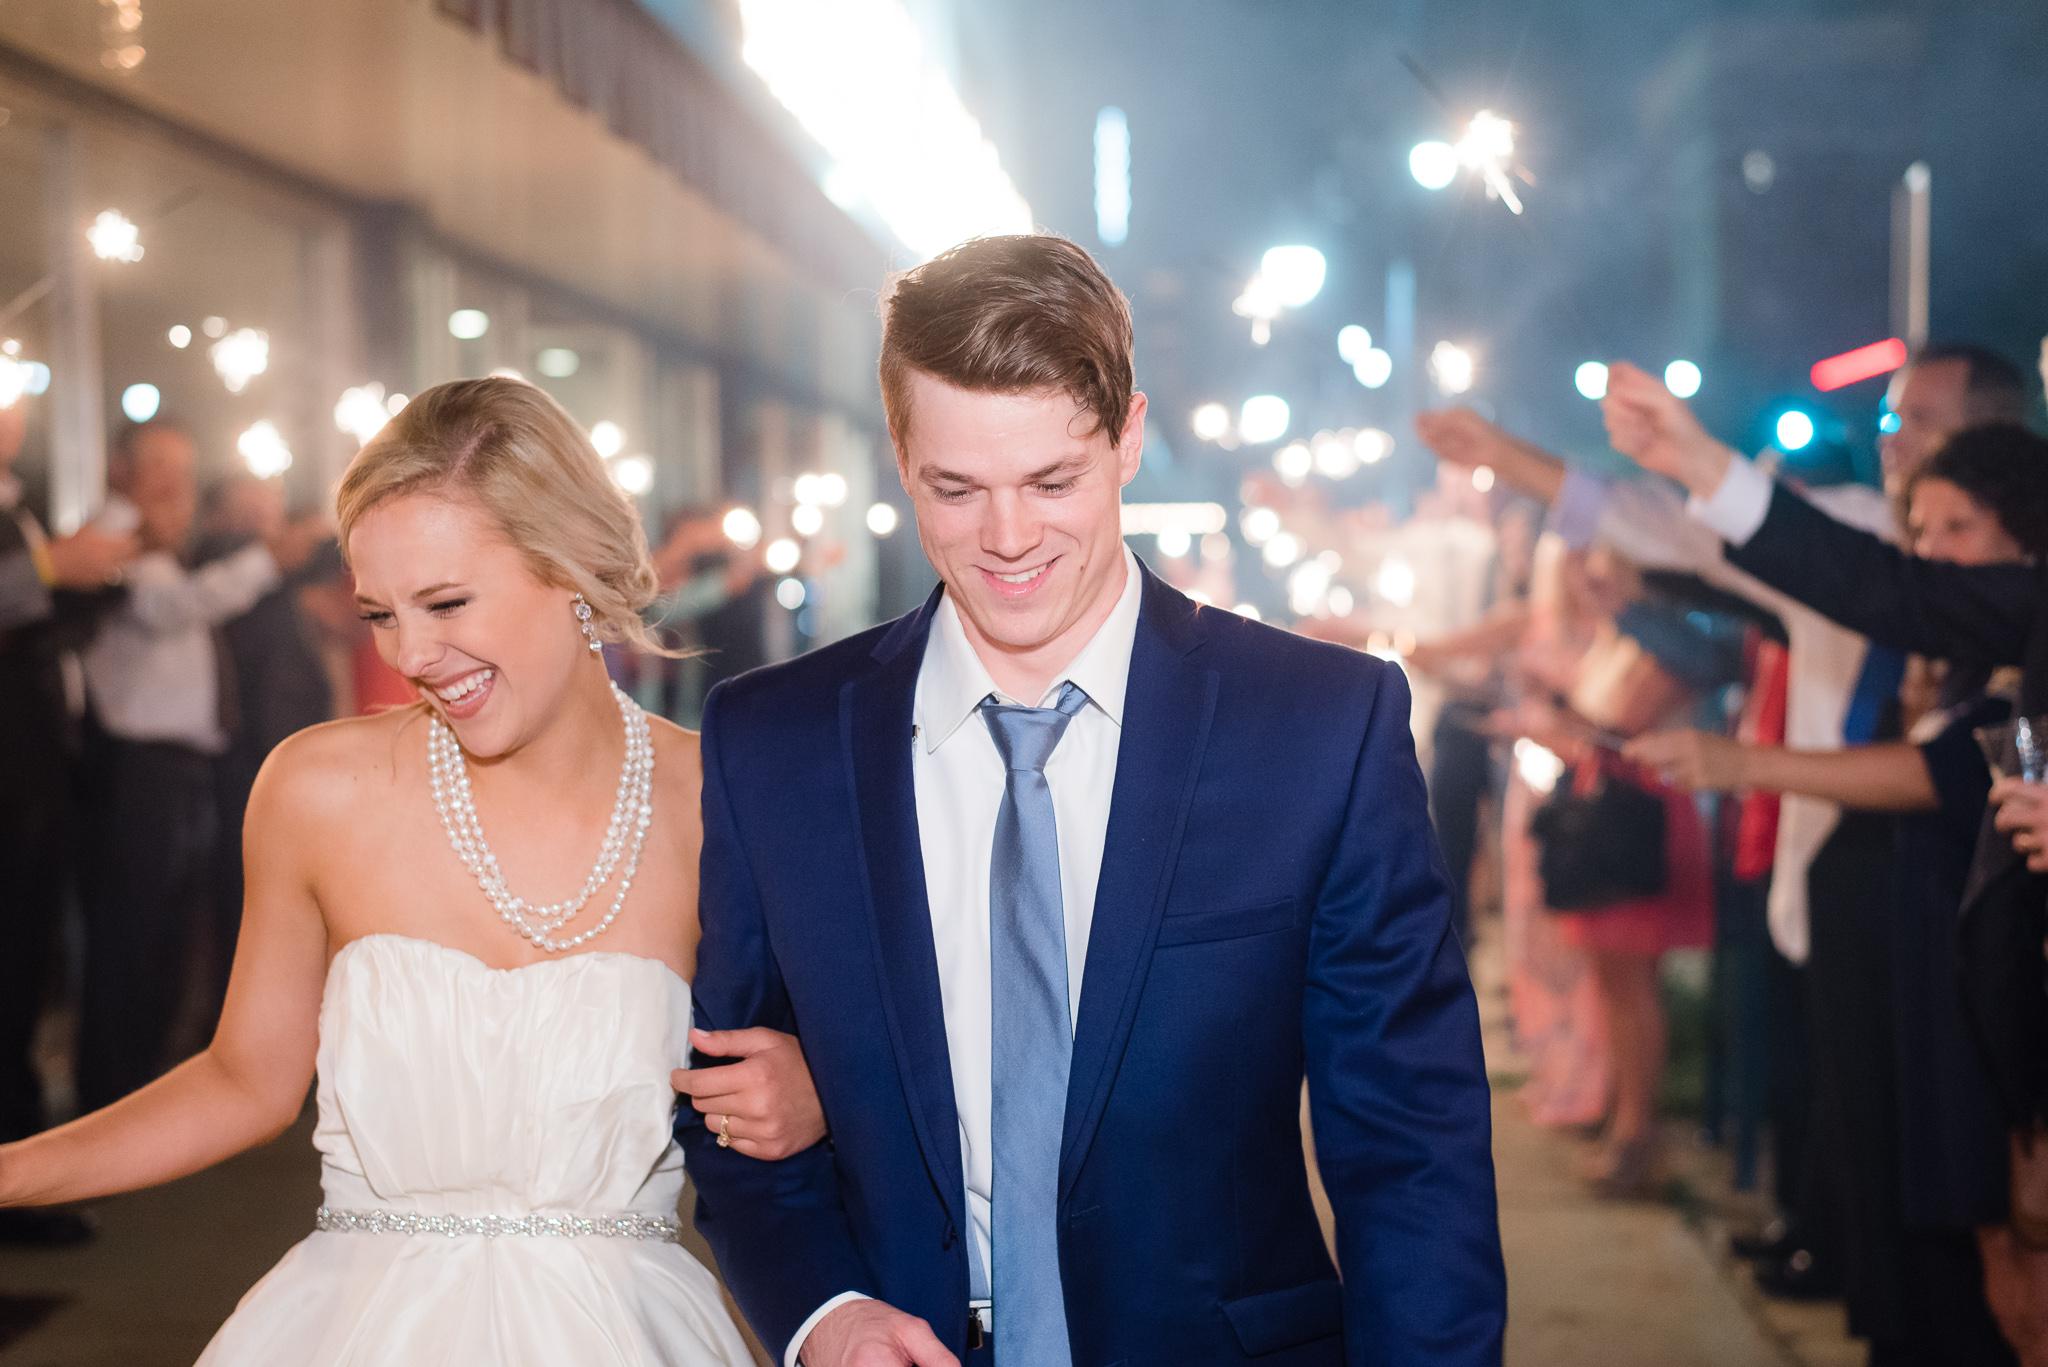 Claire-Brandons-Wedding-The-Blog-242.jpg